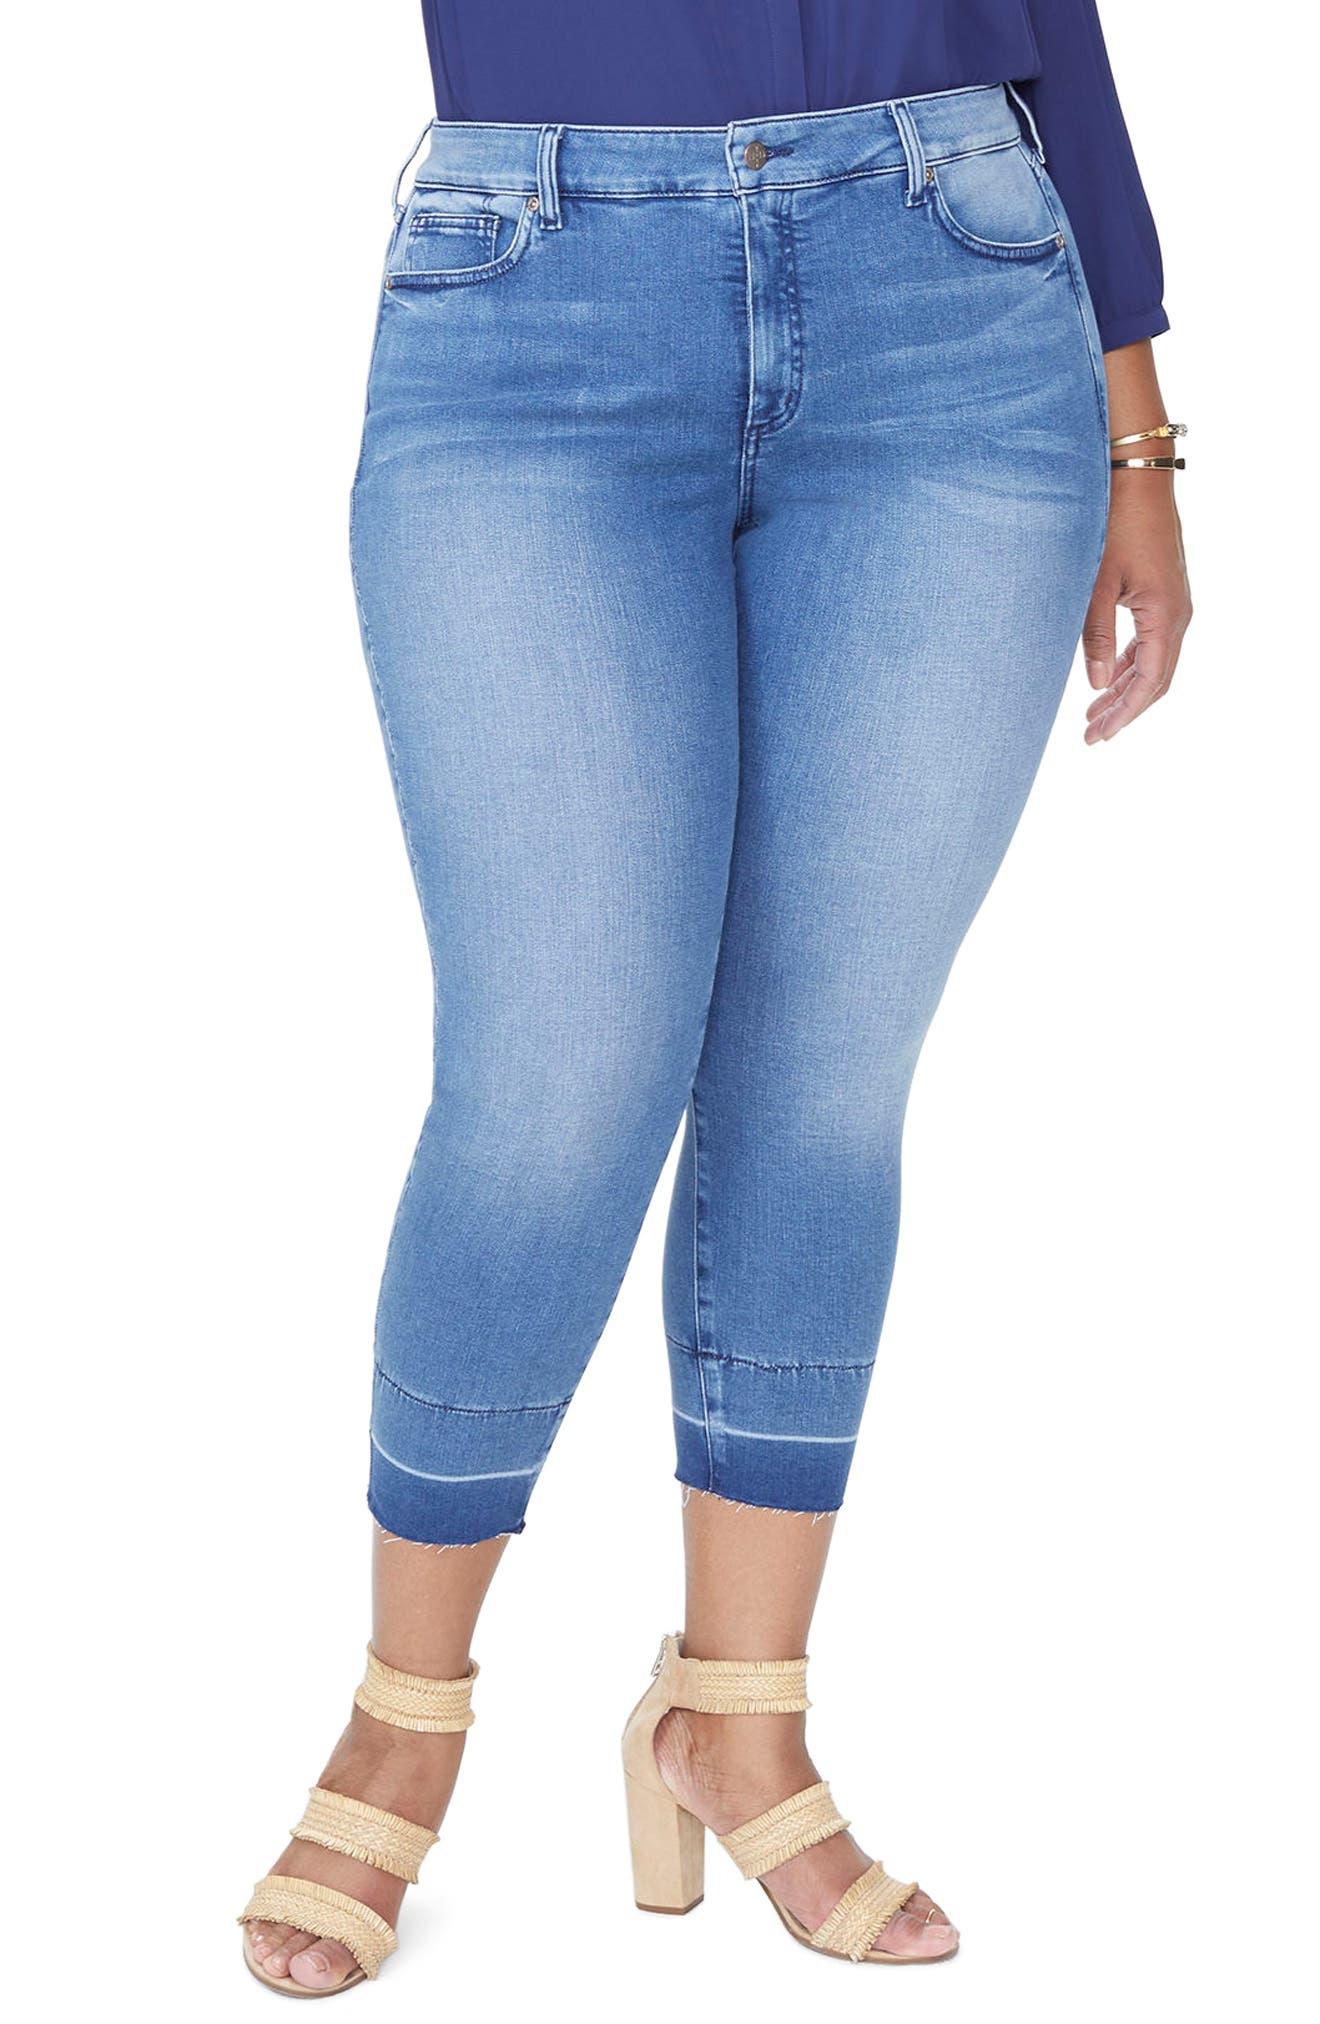 Alina Release Hem Ankle Skinny Jeans,                             Main thumbnail 1, color,                             Wishful